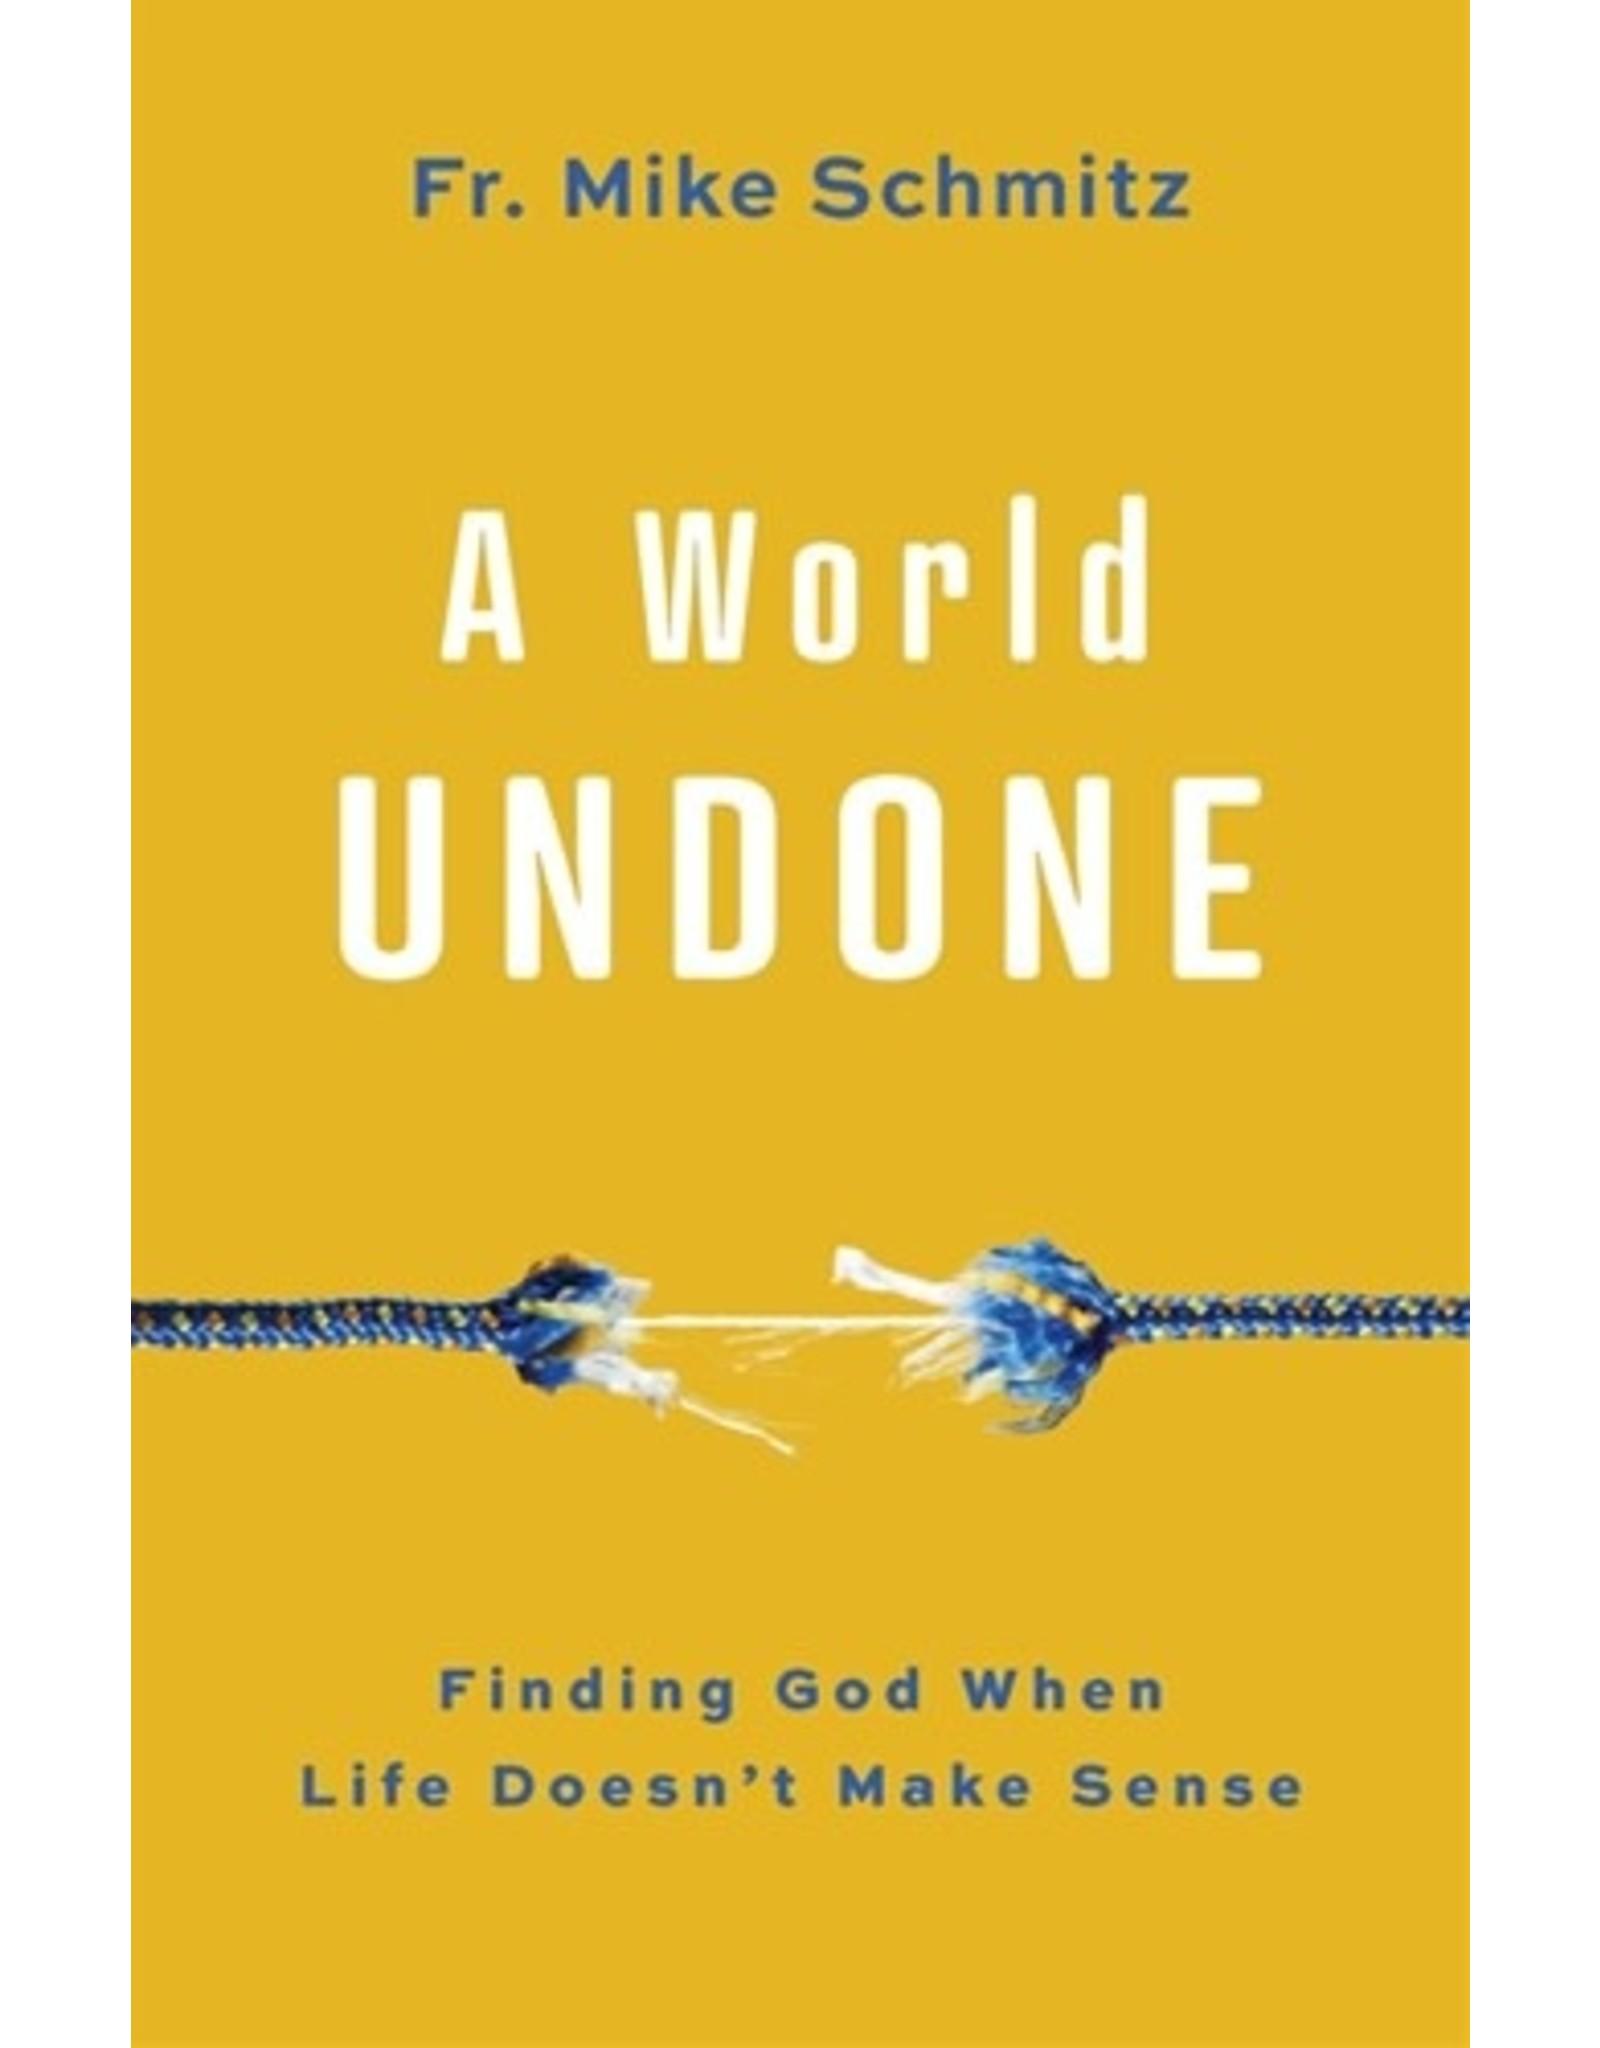 A World Undone: Finding God When Life Doesn't Make Sense